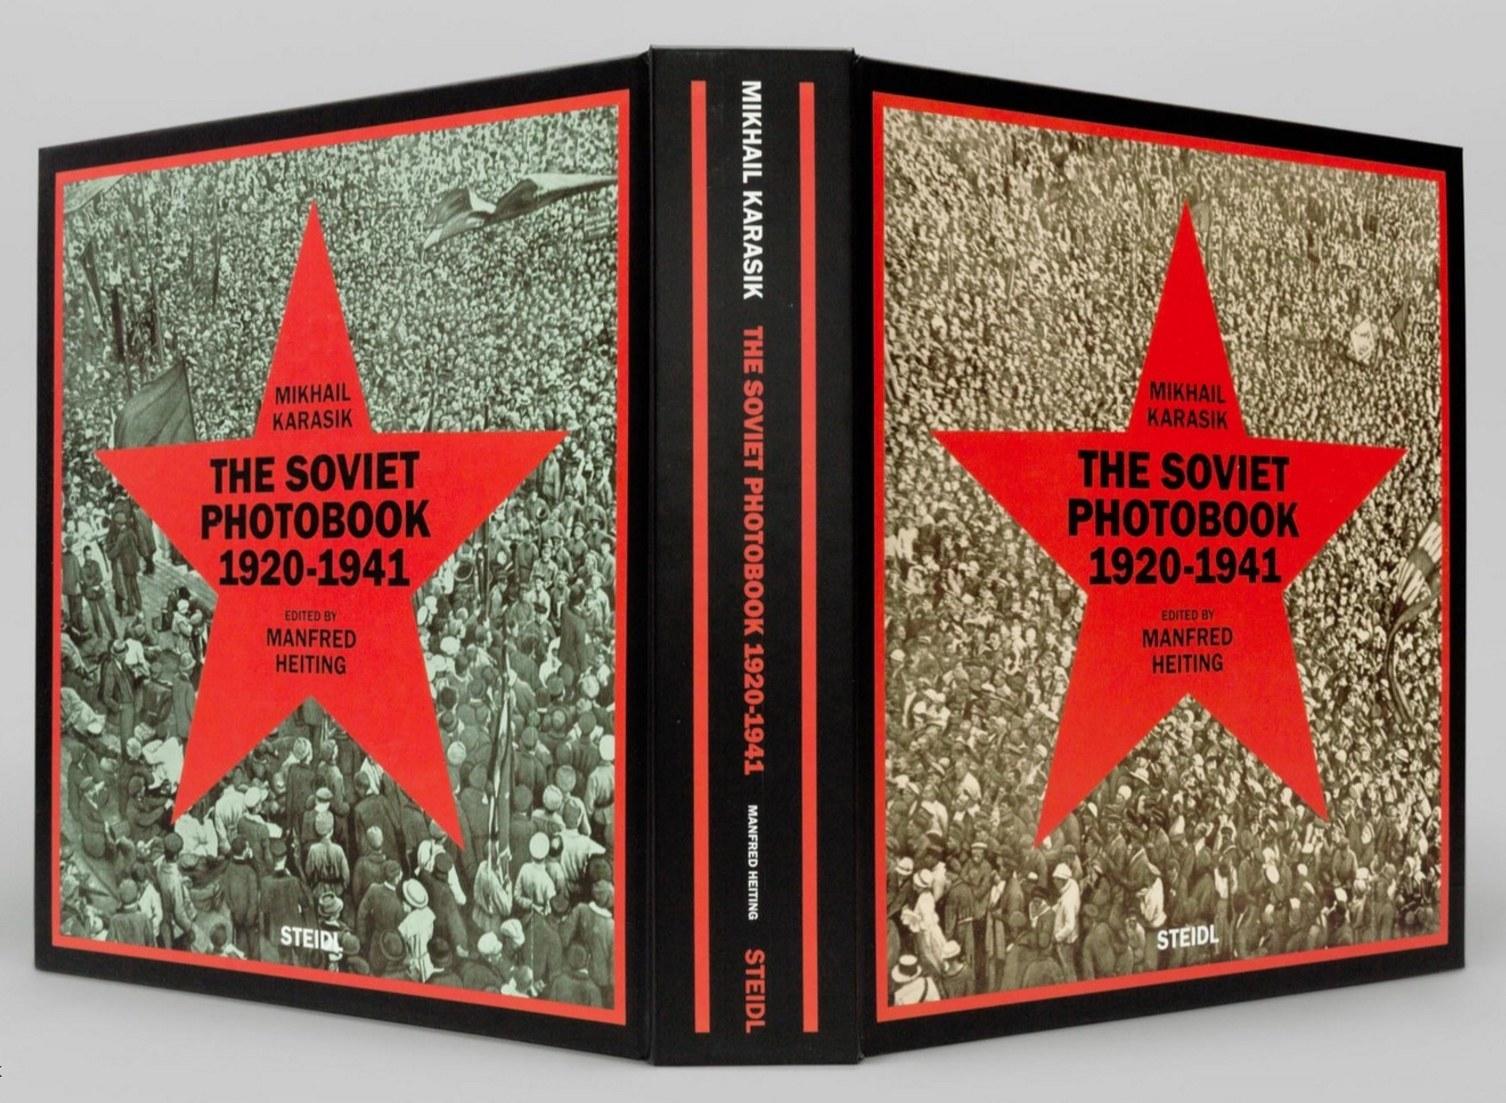 BI_151020_soviet_photo_book_steidl